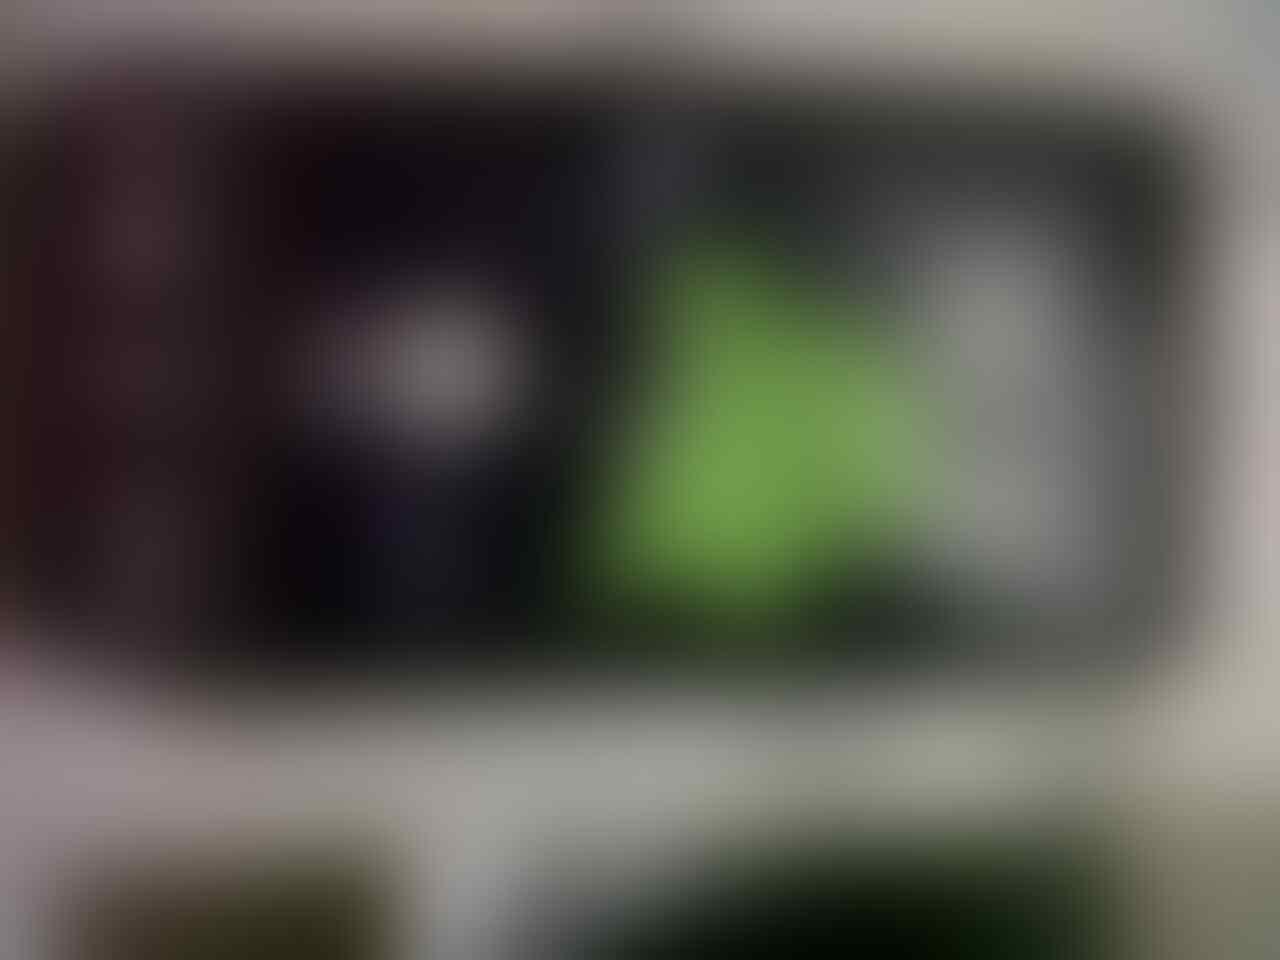 HTC Desire Bravo A8181